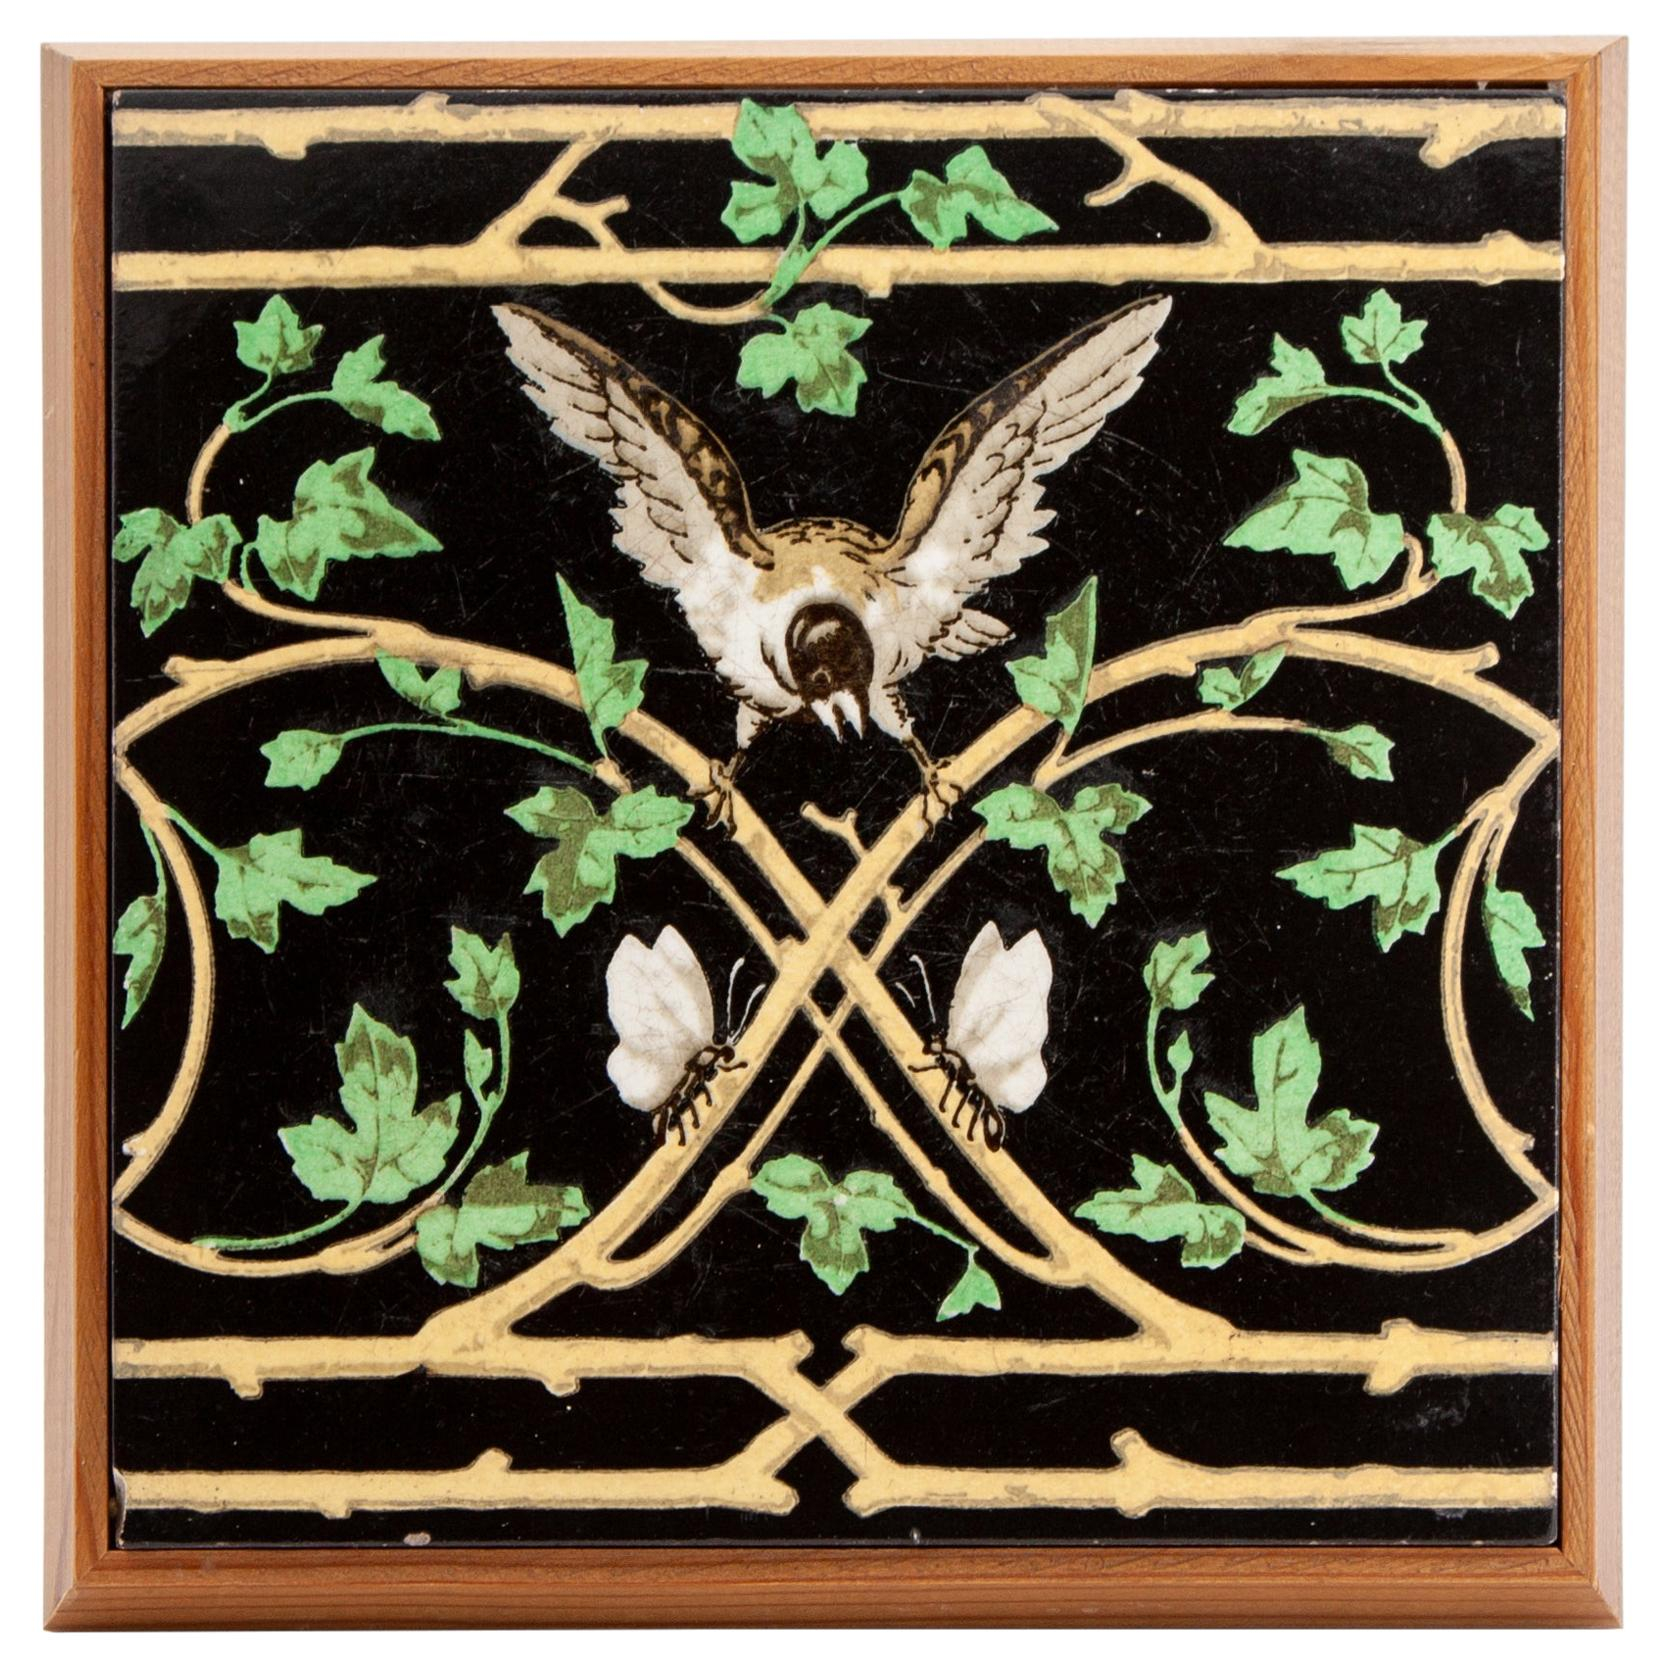 Arts & Crafts Minton Pottery Tile Designed by Christopher Dresser